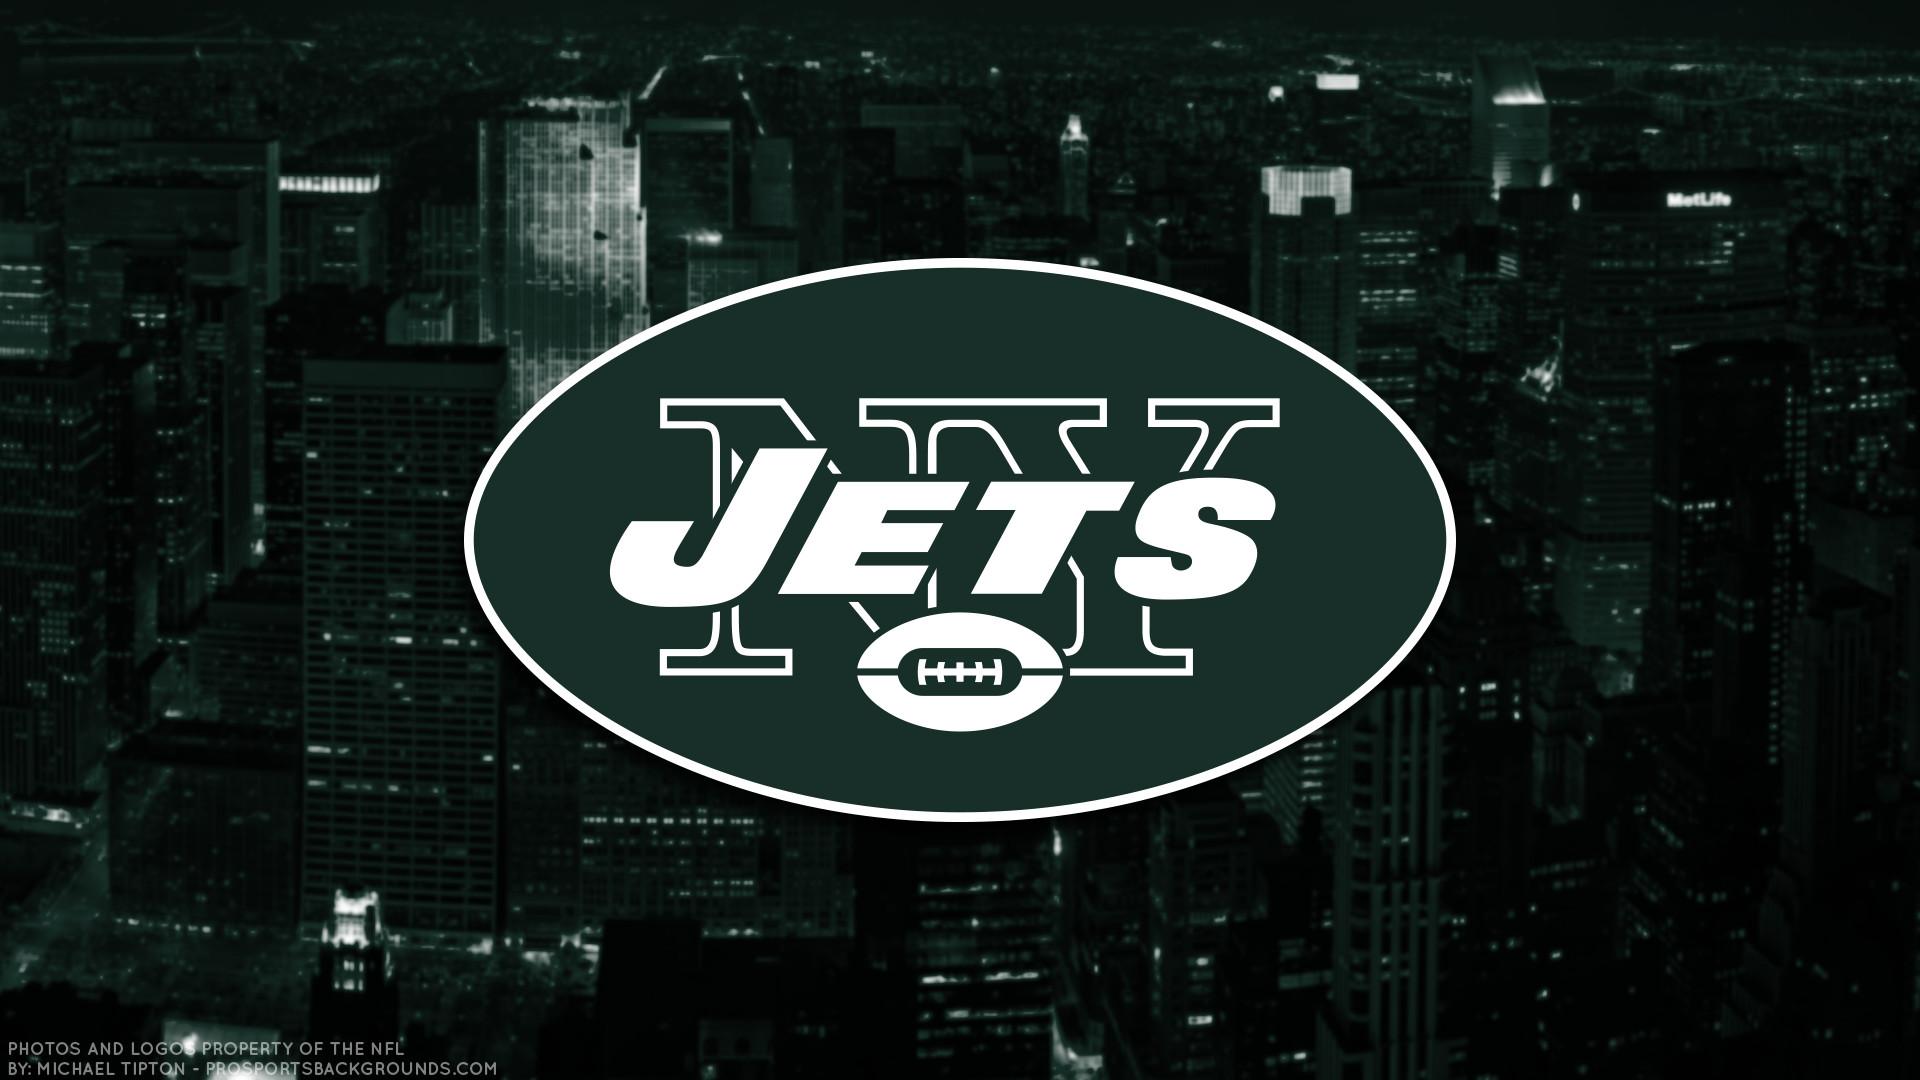 … new york jets 2017 football logo wallpaper pc desktop computer nfl  background